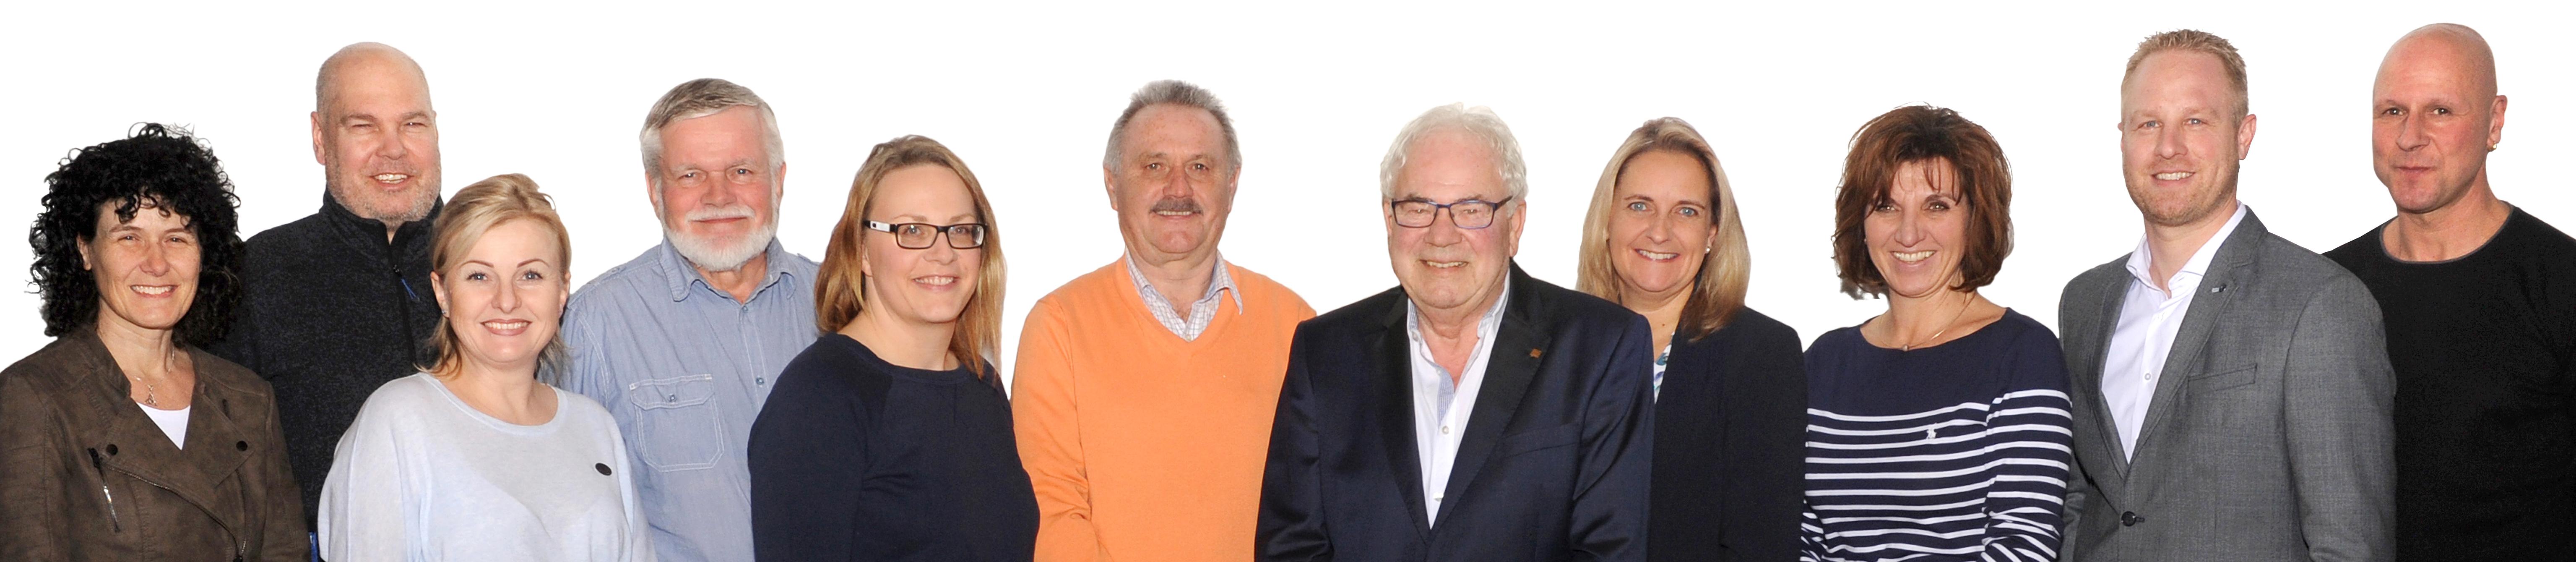 Präsidium 2019 SV Büchenbronnn e.V.